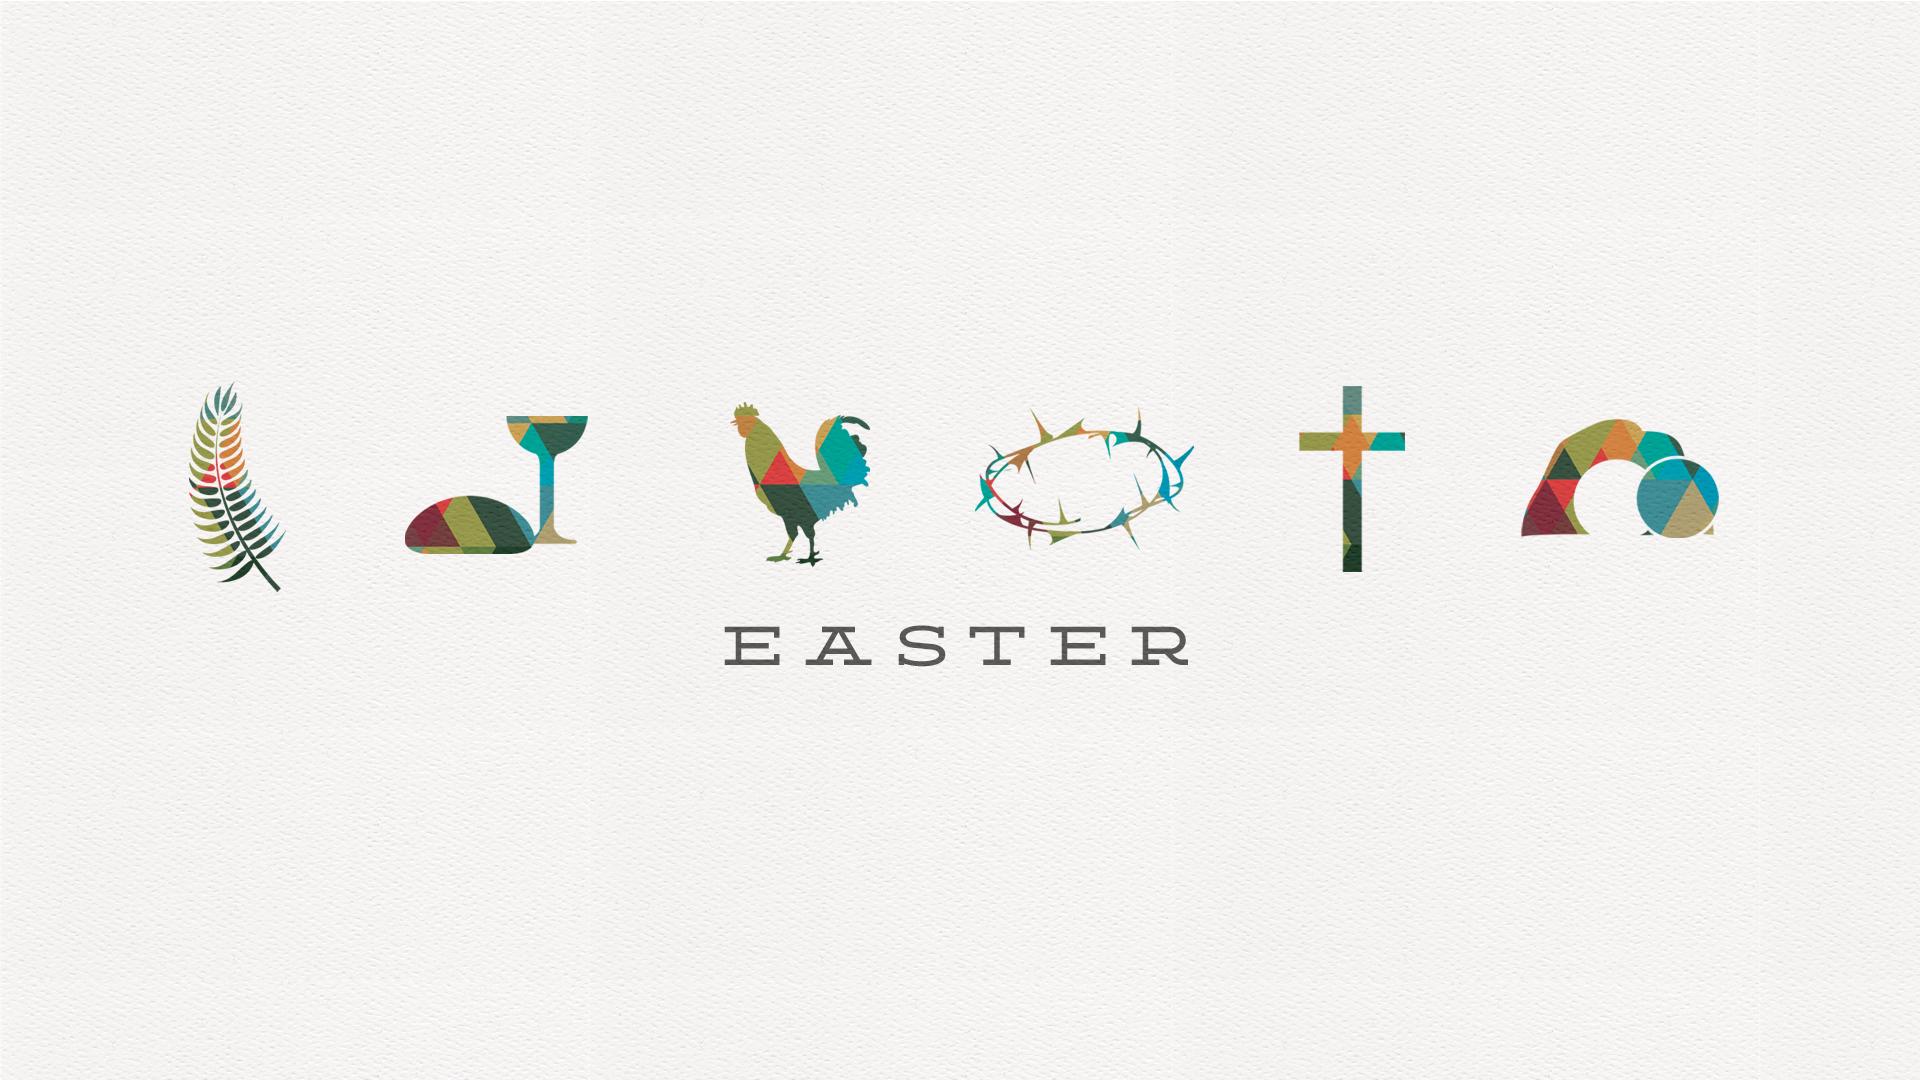 13484_Easter_Icons_2.jpg